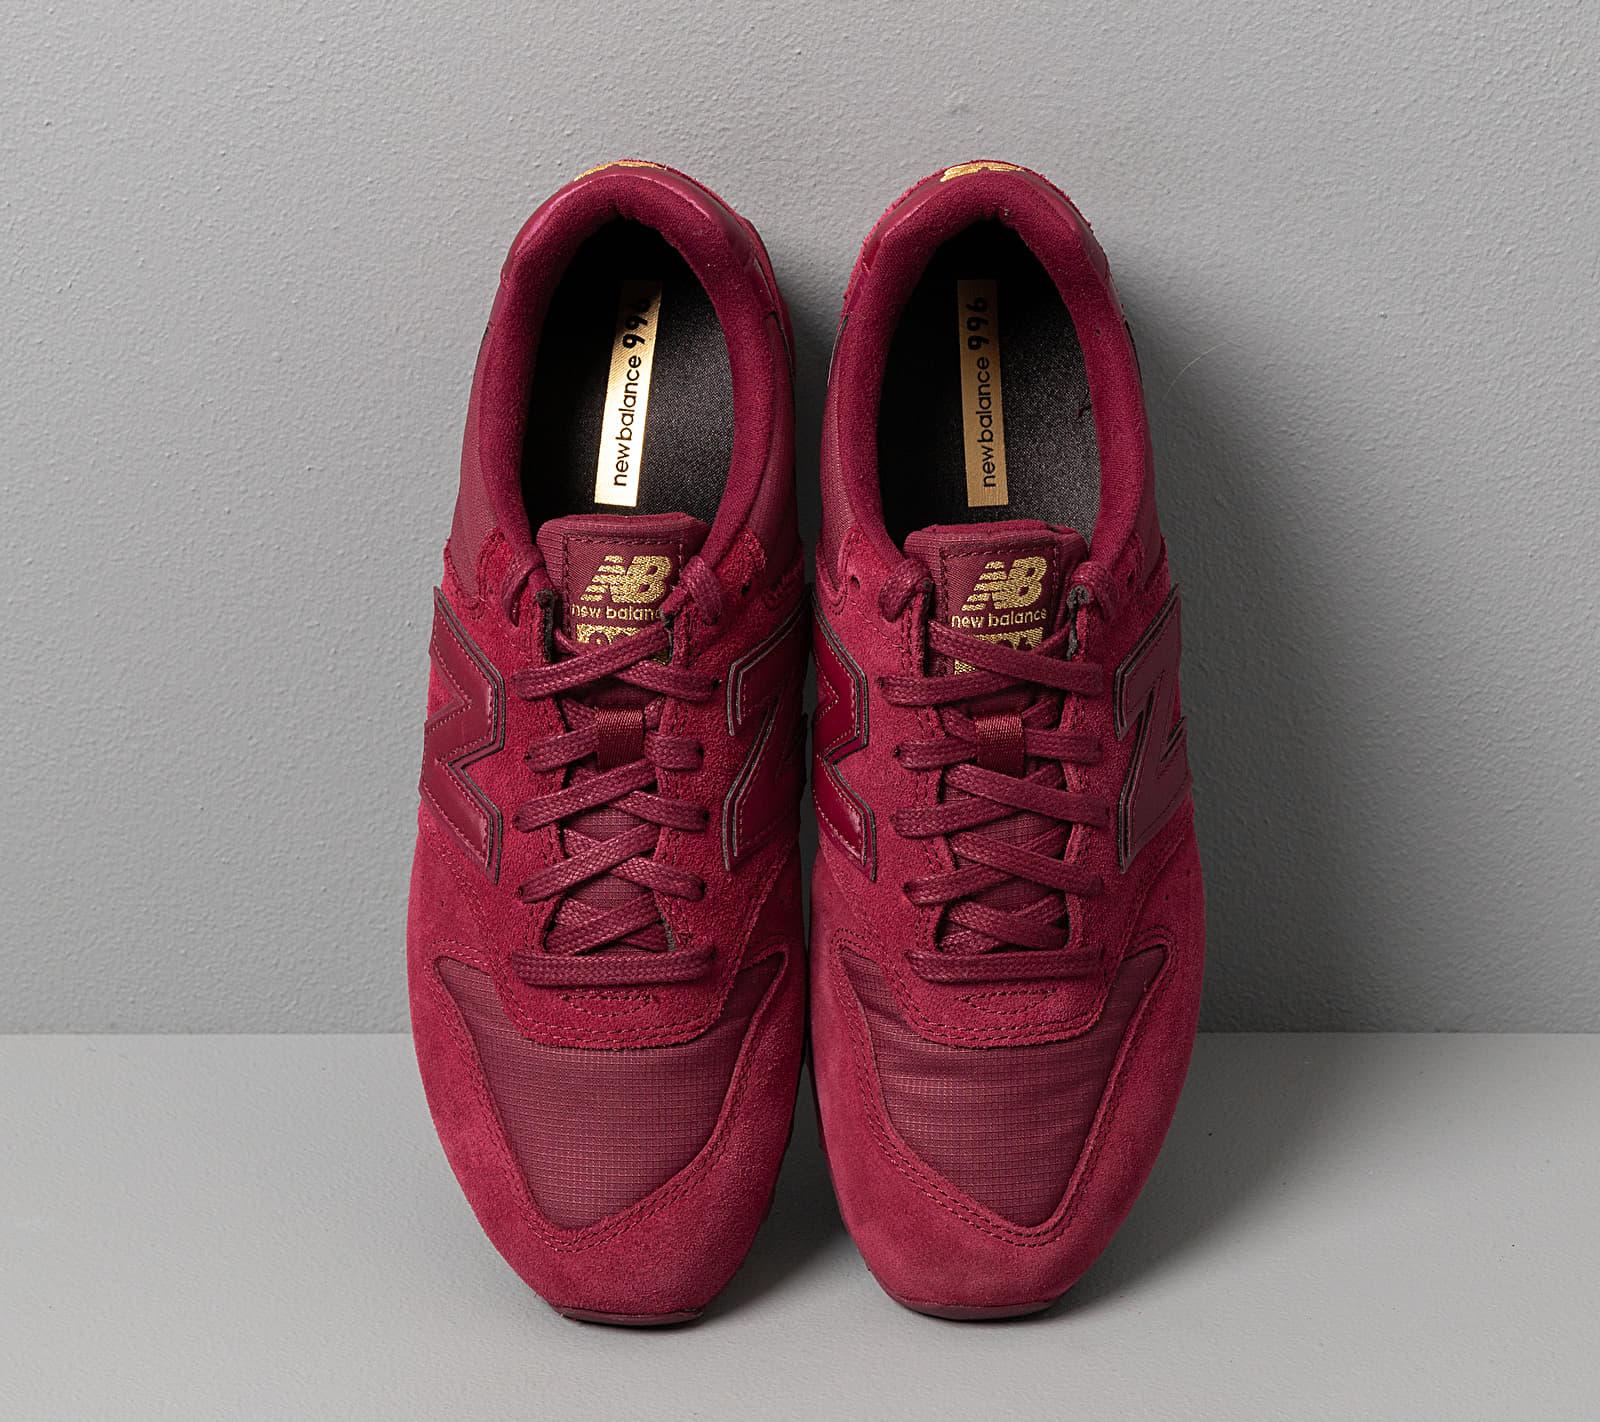 New Balance 996 Burgundy, Red